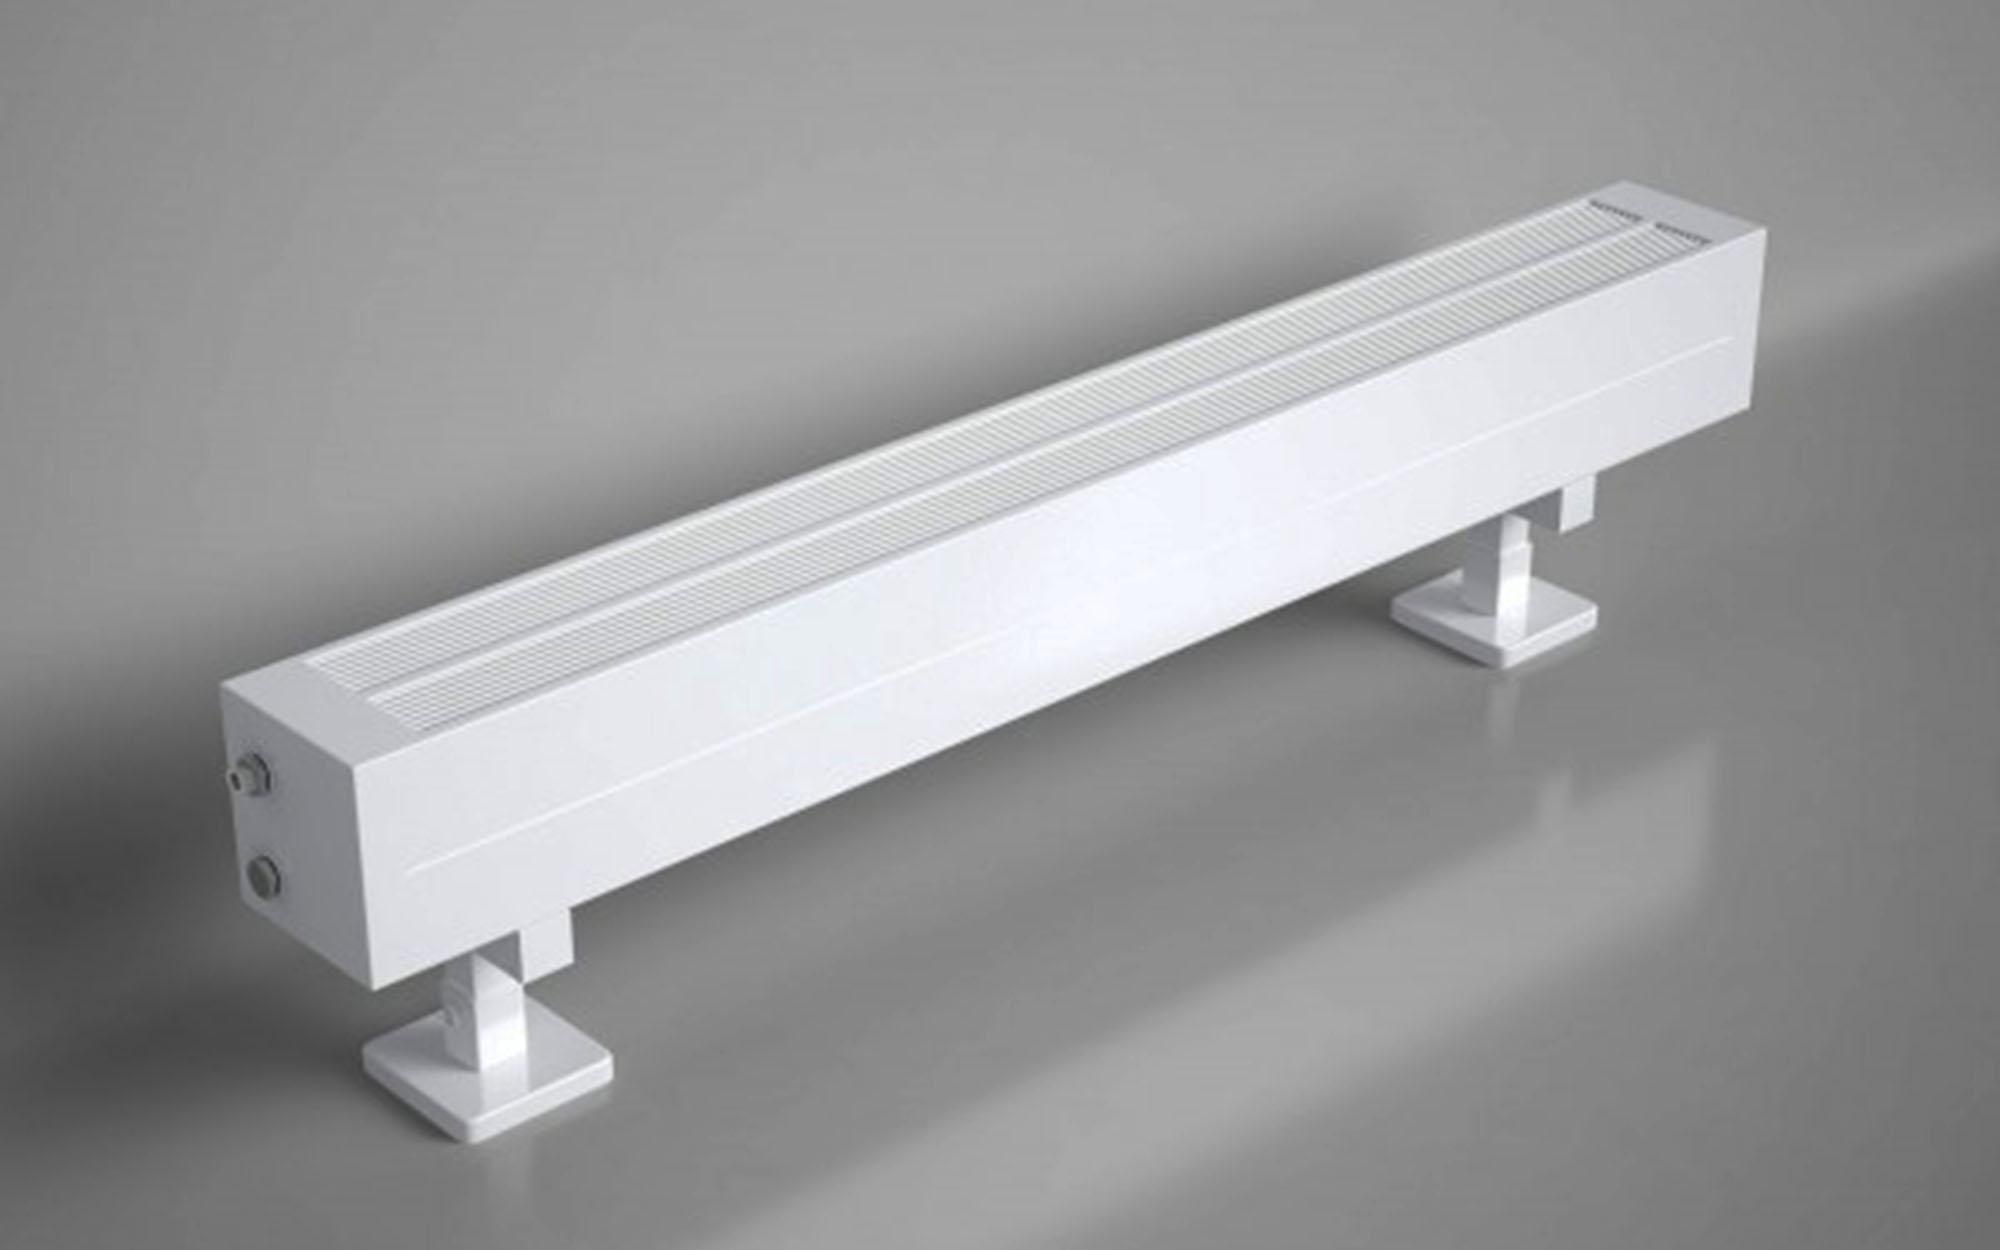 r sign konvektor k radiatordesign radiatordesign. Black Bedroom Furniture Sets. Home Design Ideas